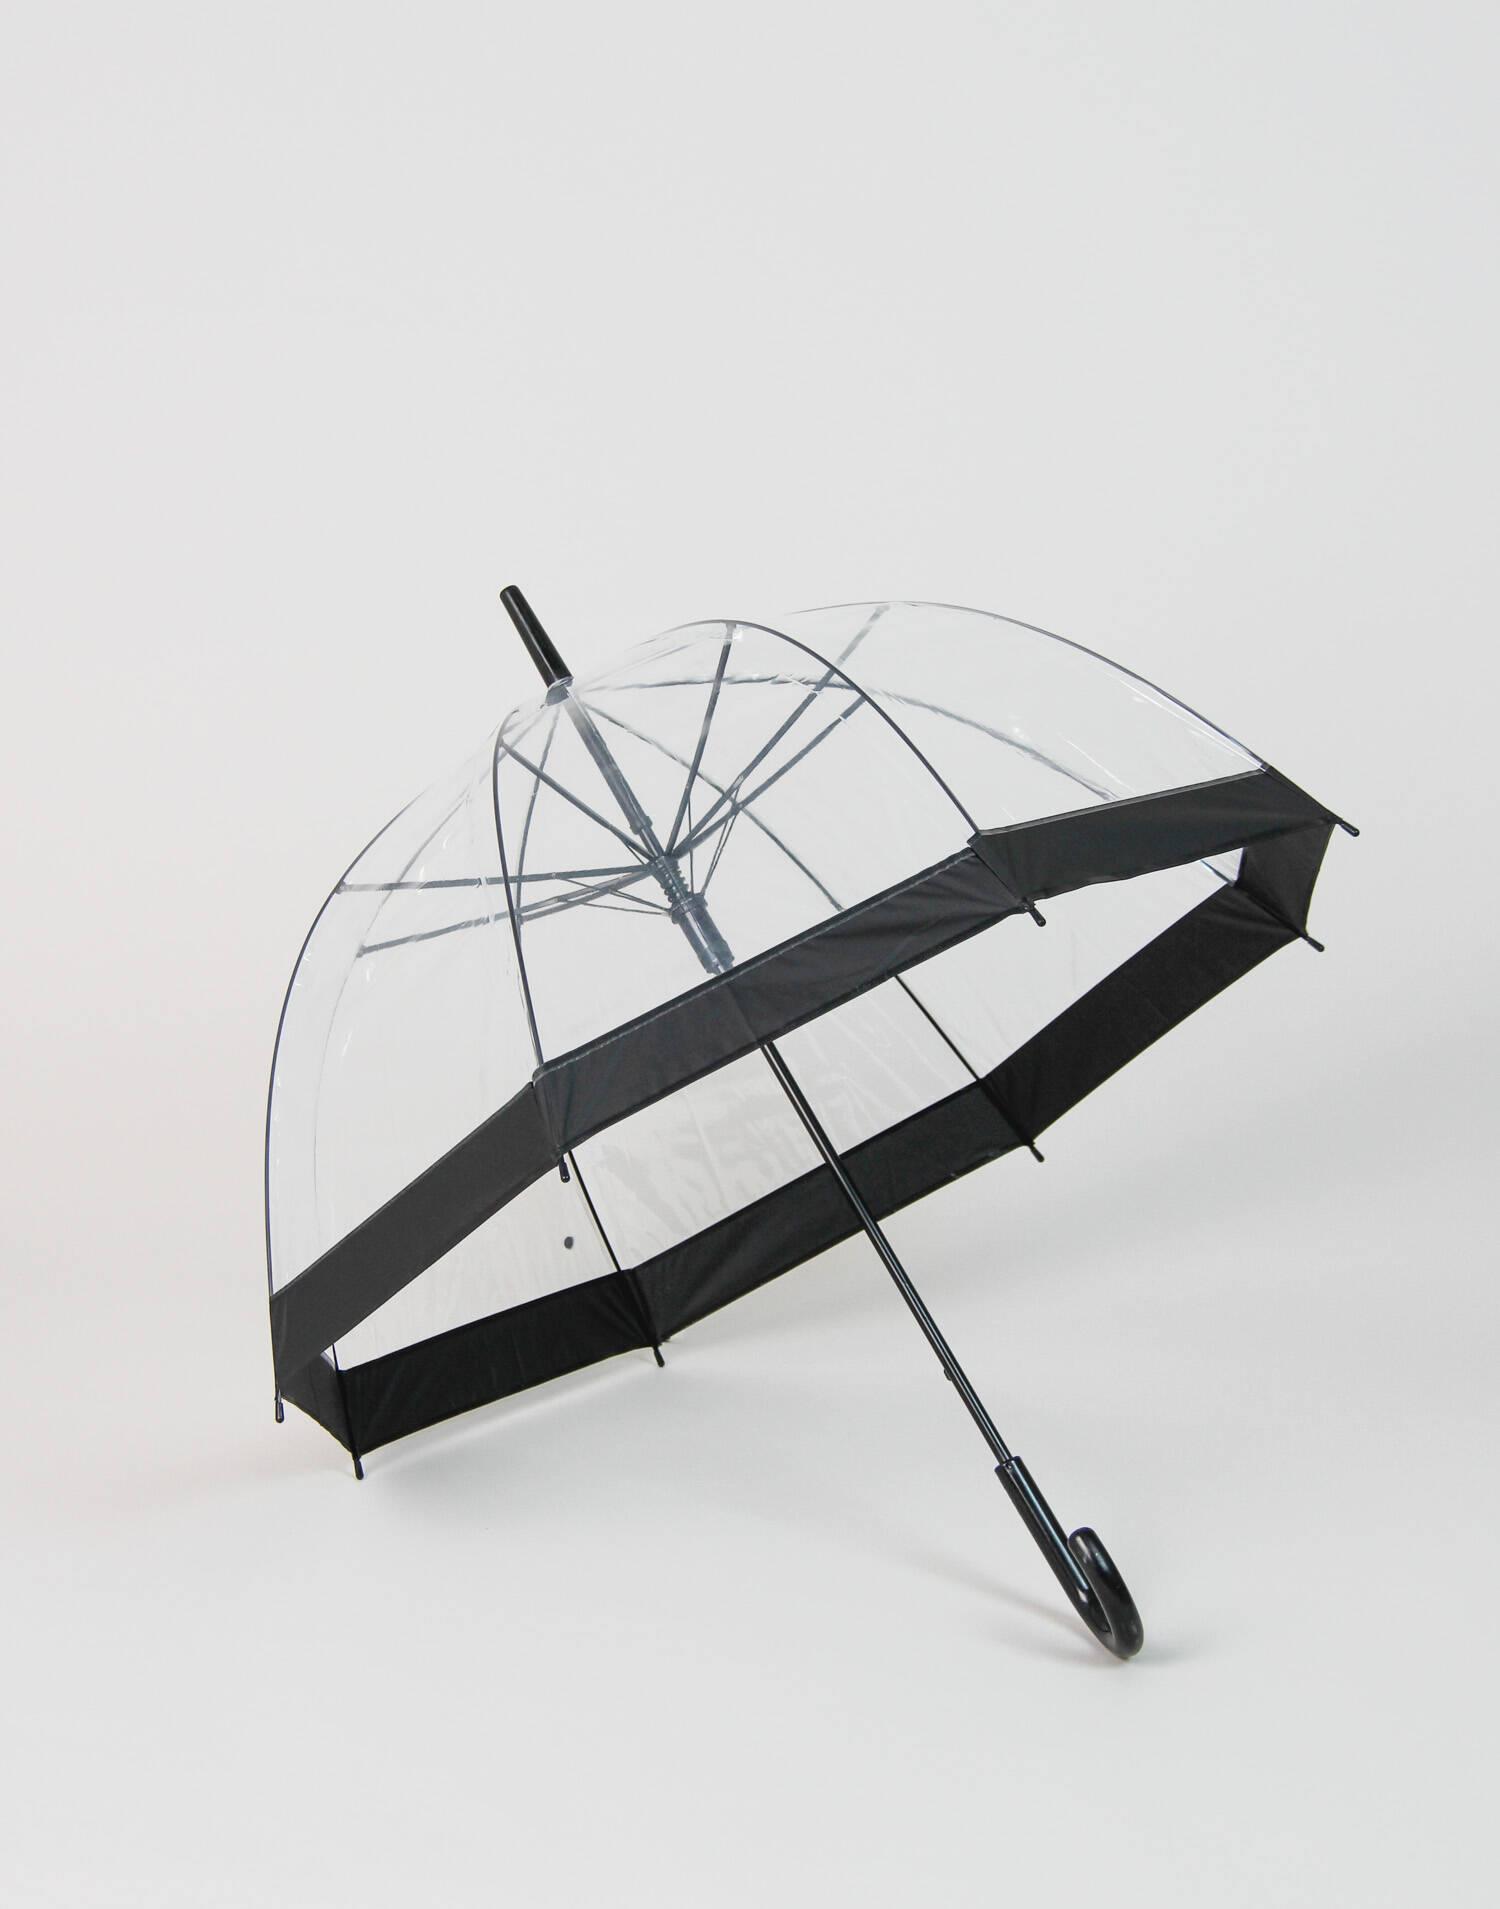 Runder und kugelförmiger regenschirm